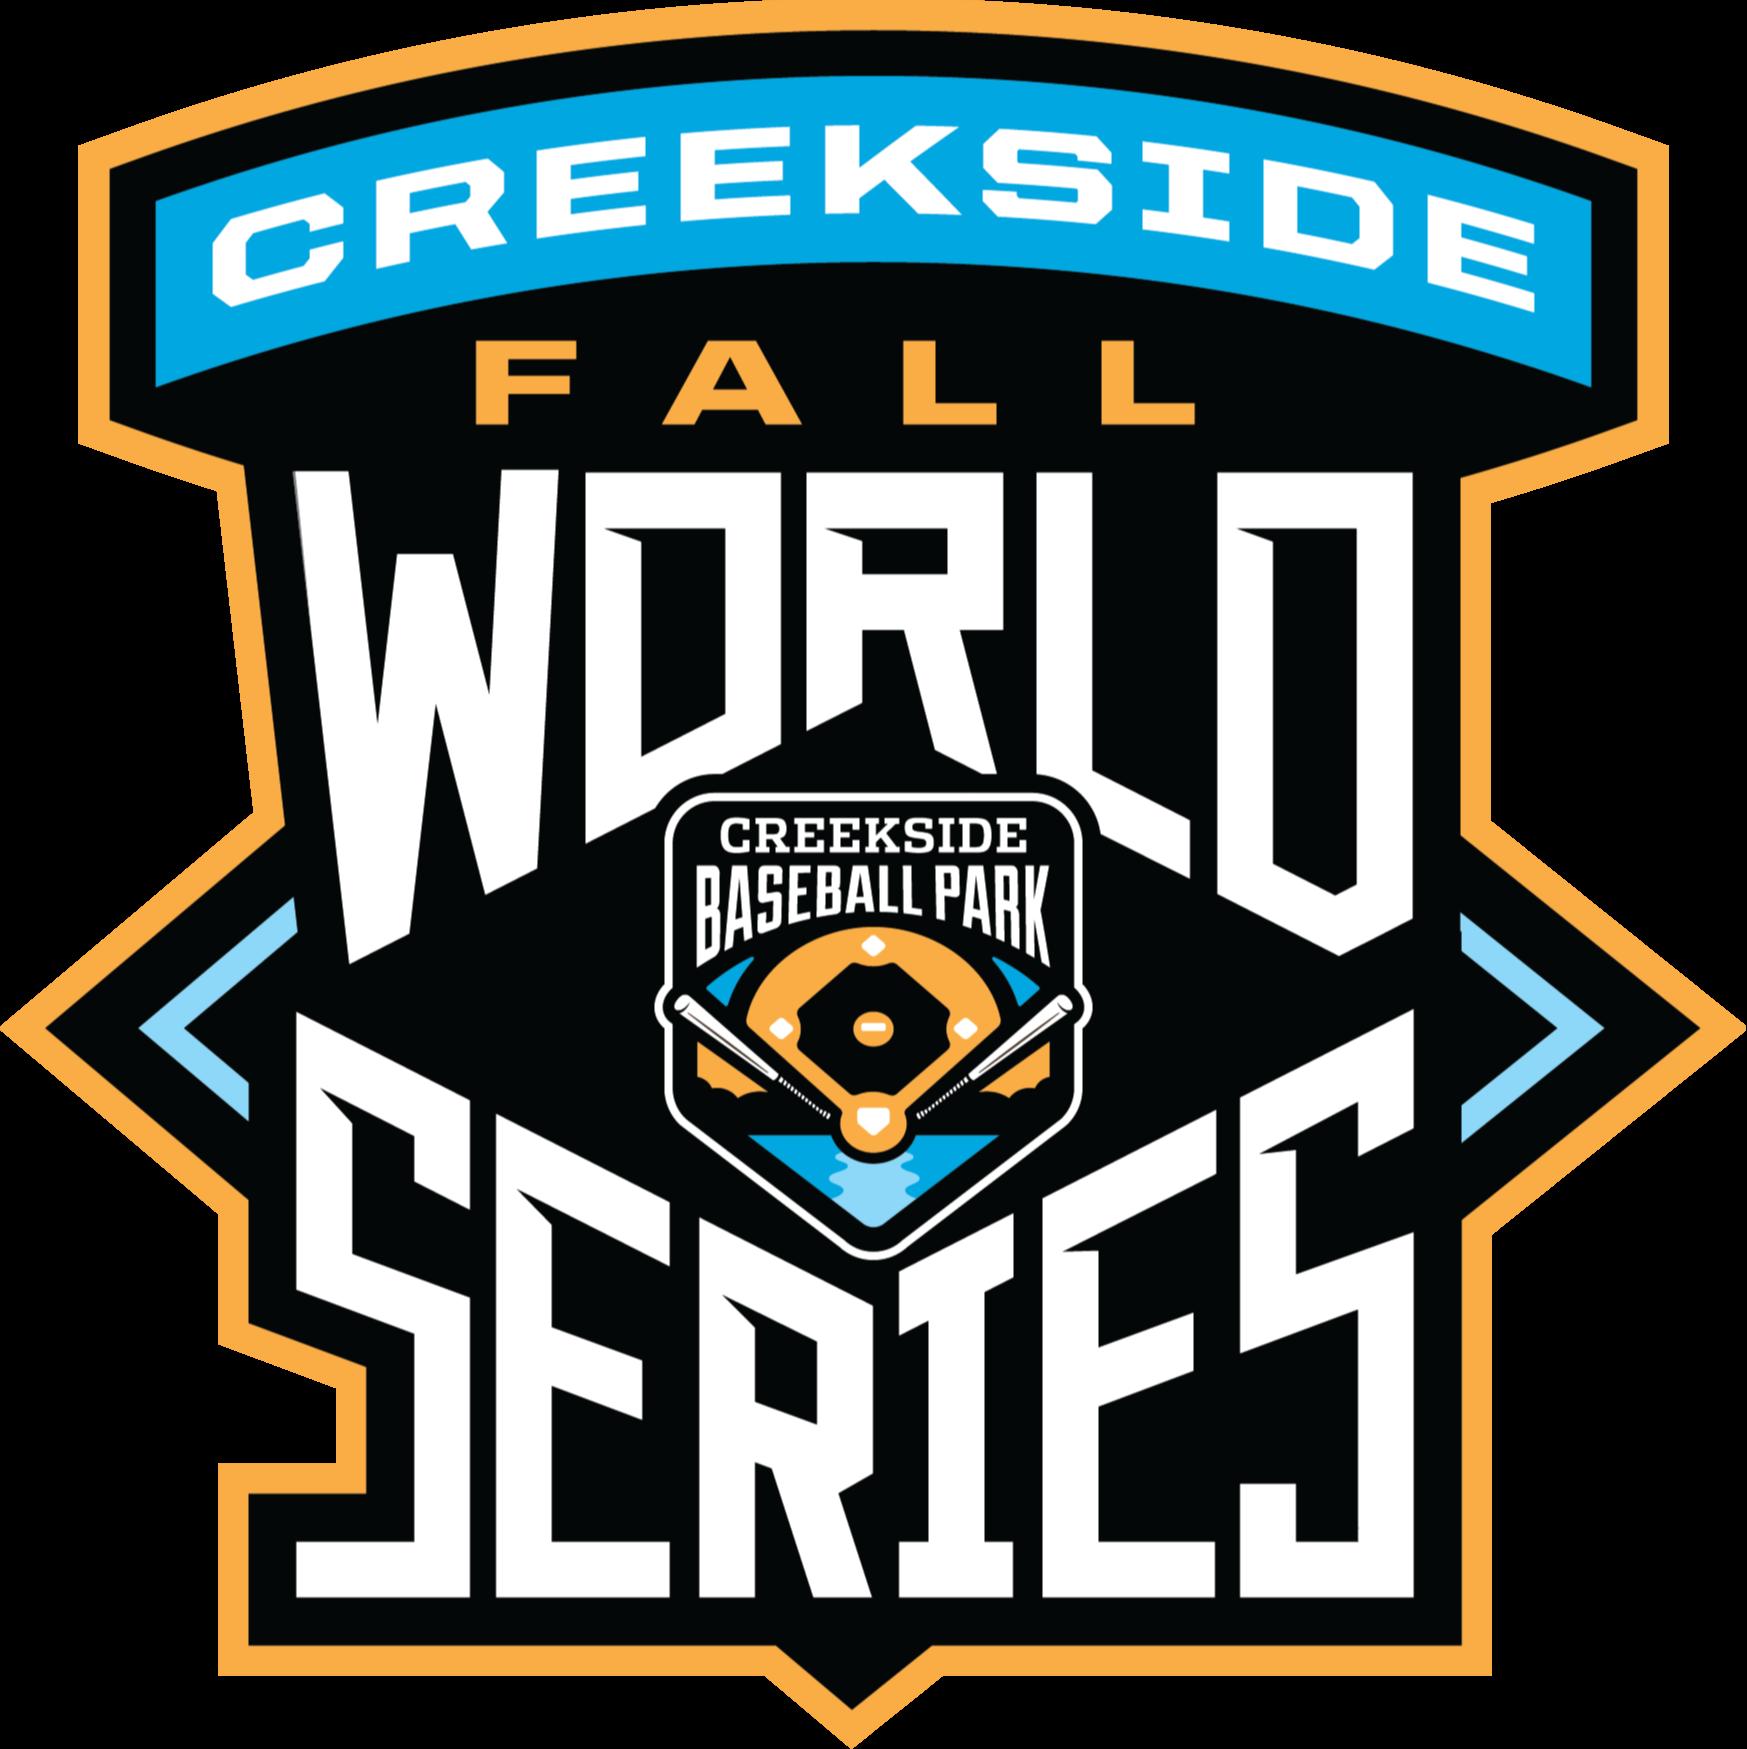 Creekside Fall World Series